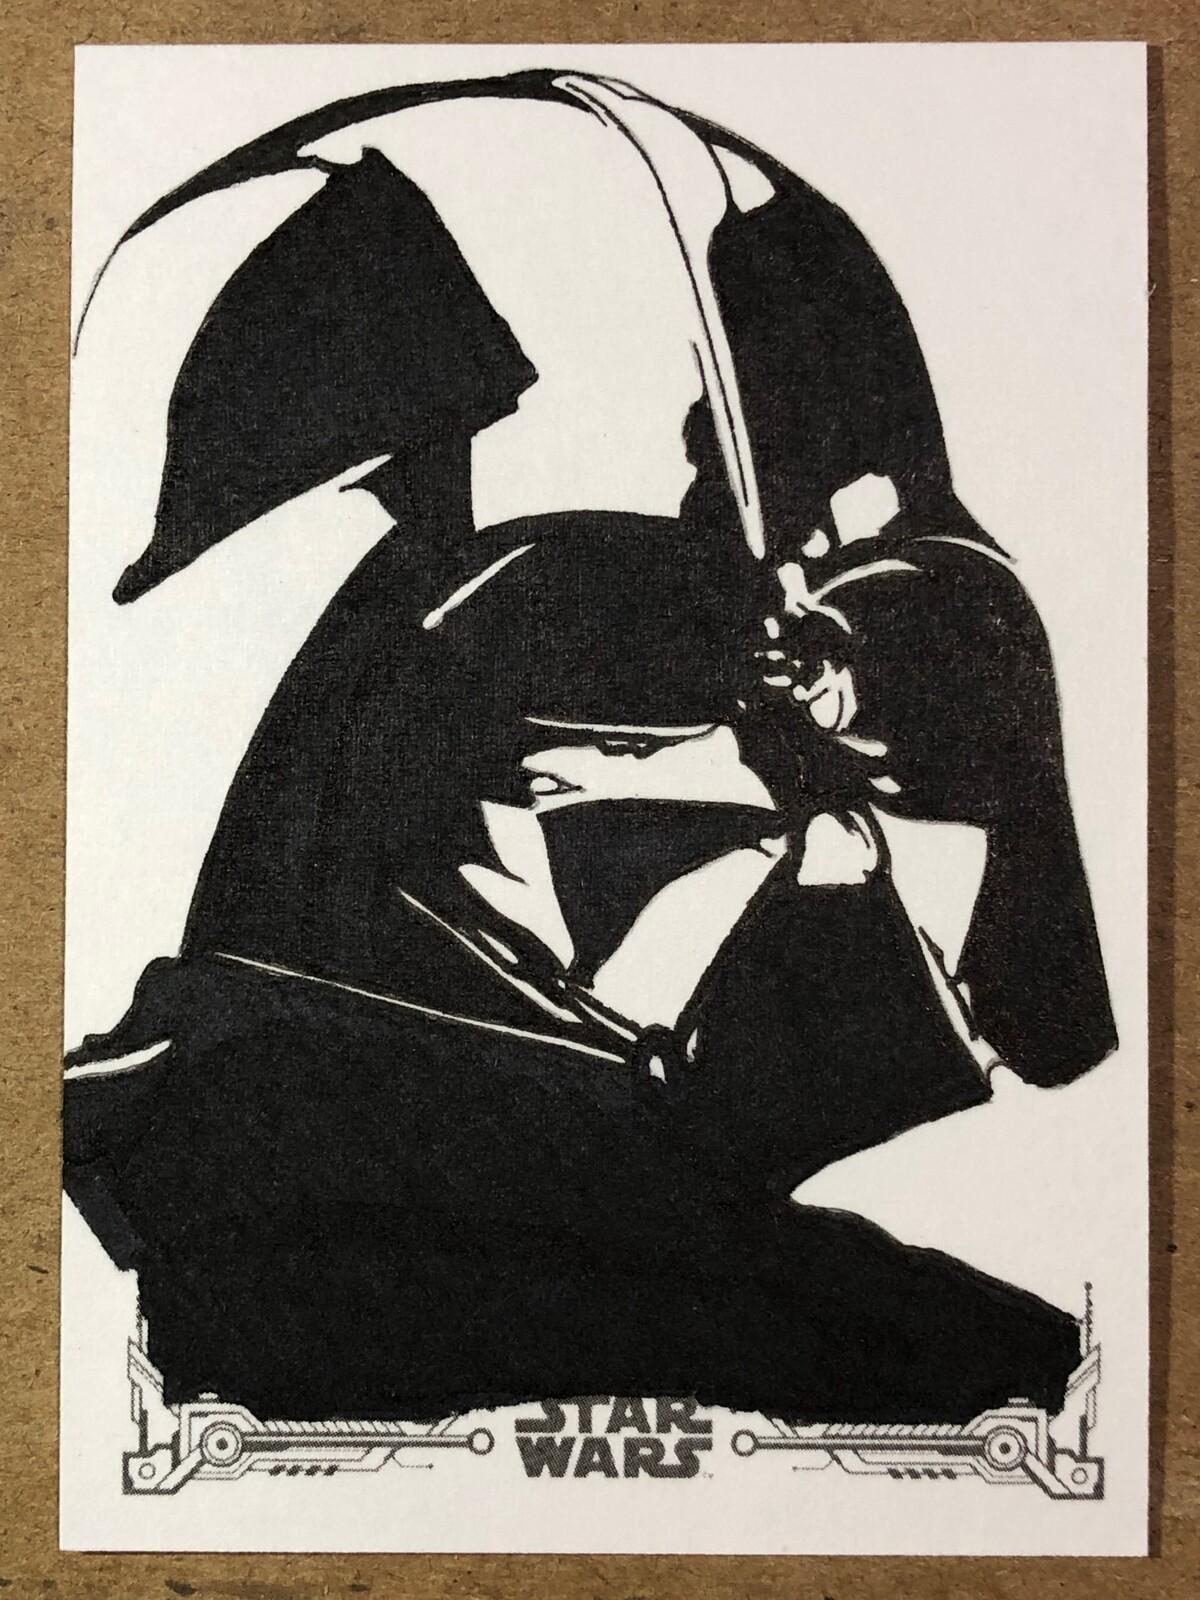 Topps Star Wars Empire Strikes Back Officially Licensed Art Cards